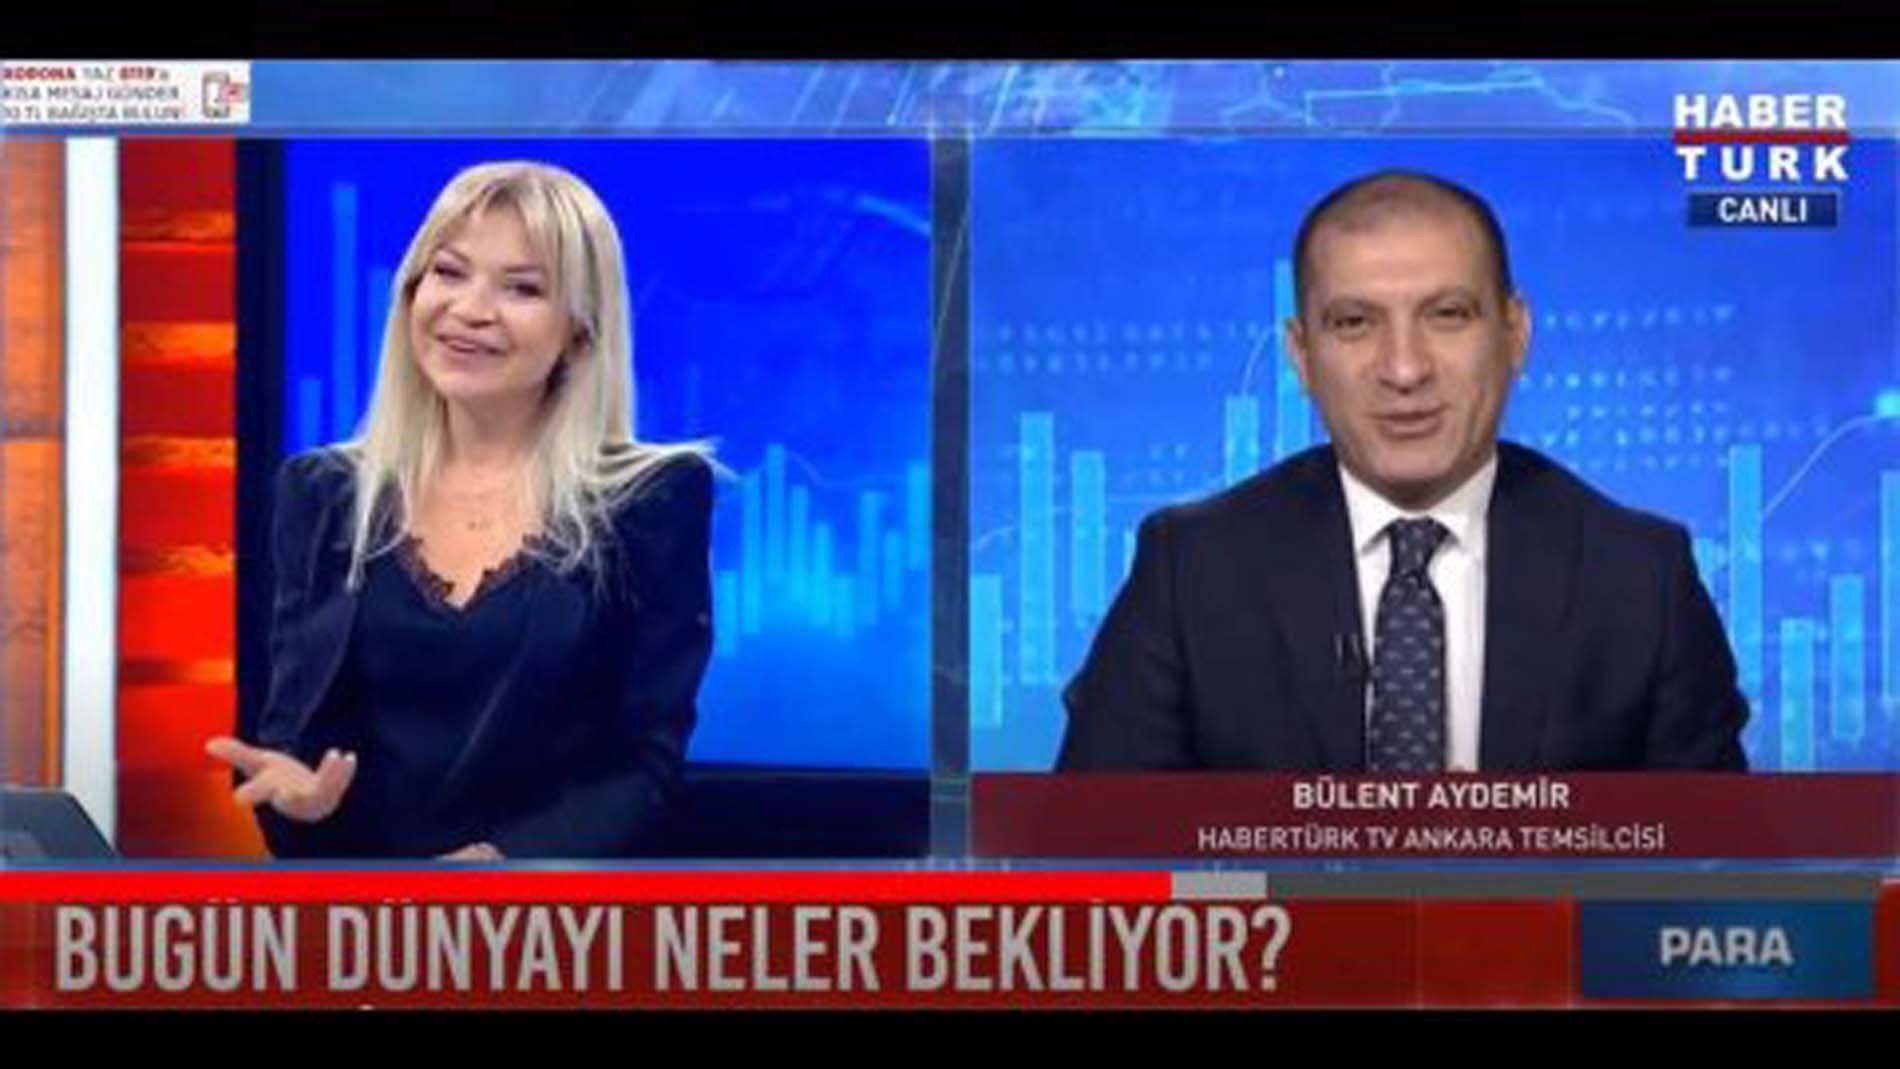 Habertürk Para Gündem Bülent Aydemir neden yok? Bülent Aydemir'e ne oldu 6 Mayıs 2021 Perşembe ?